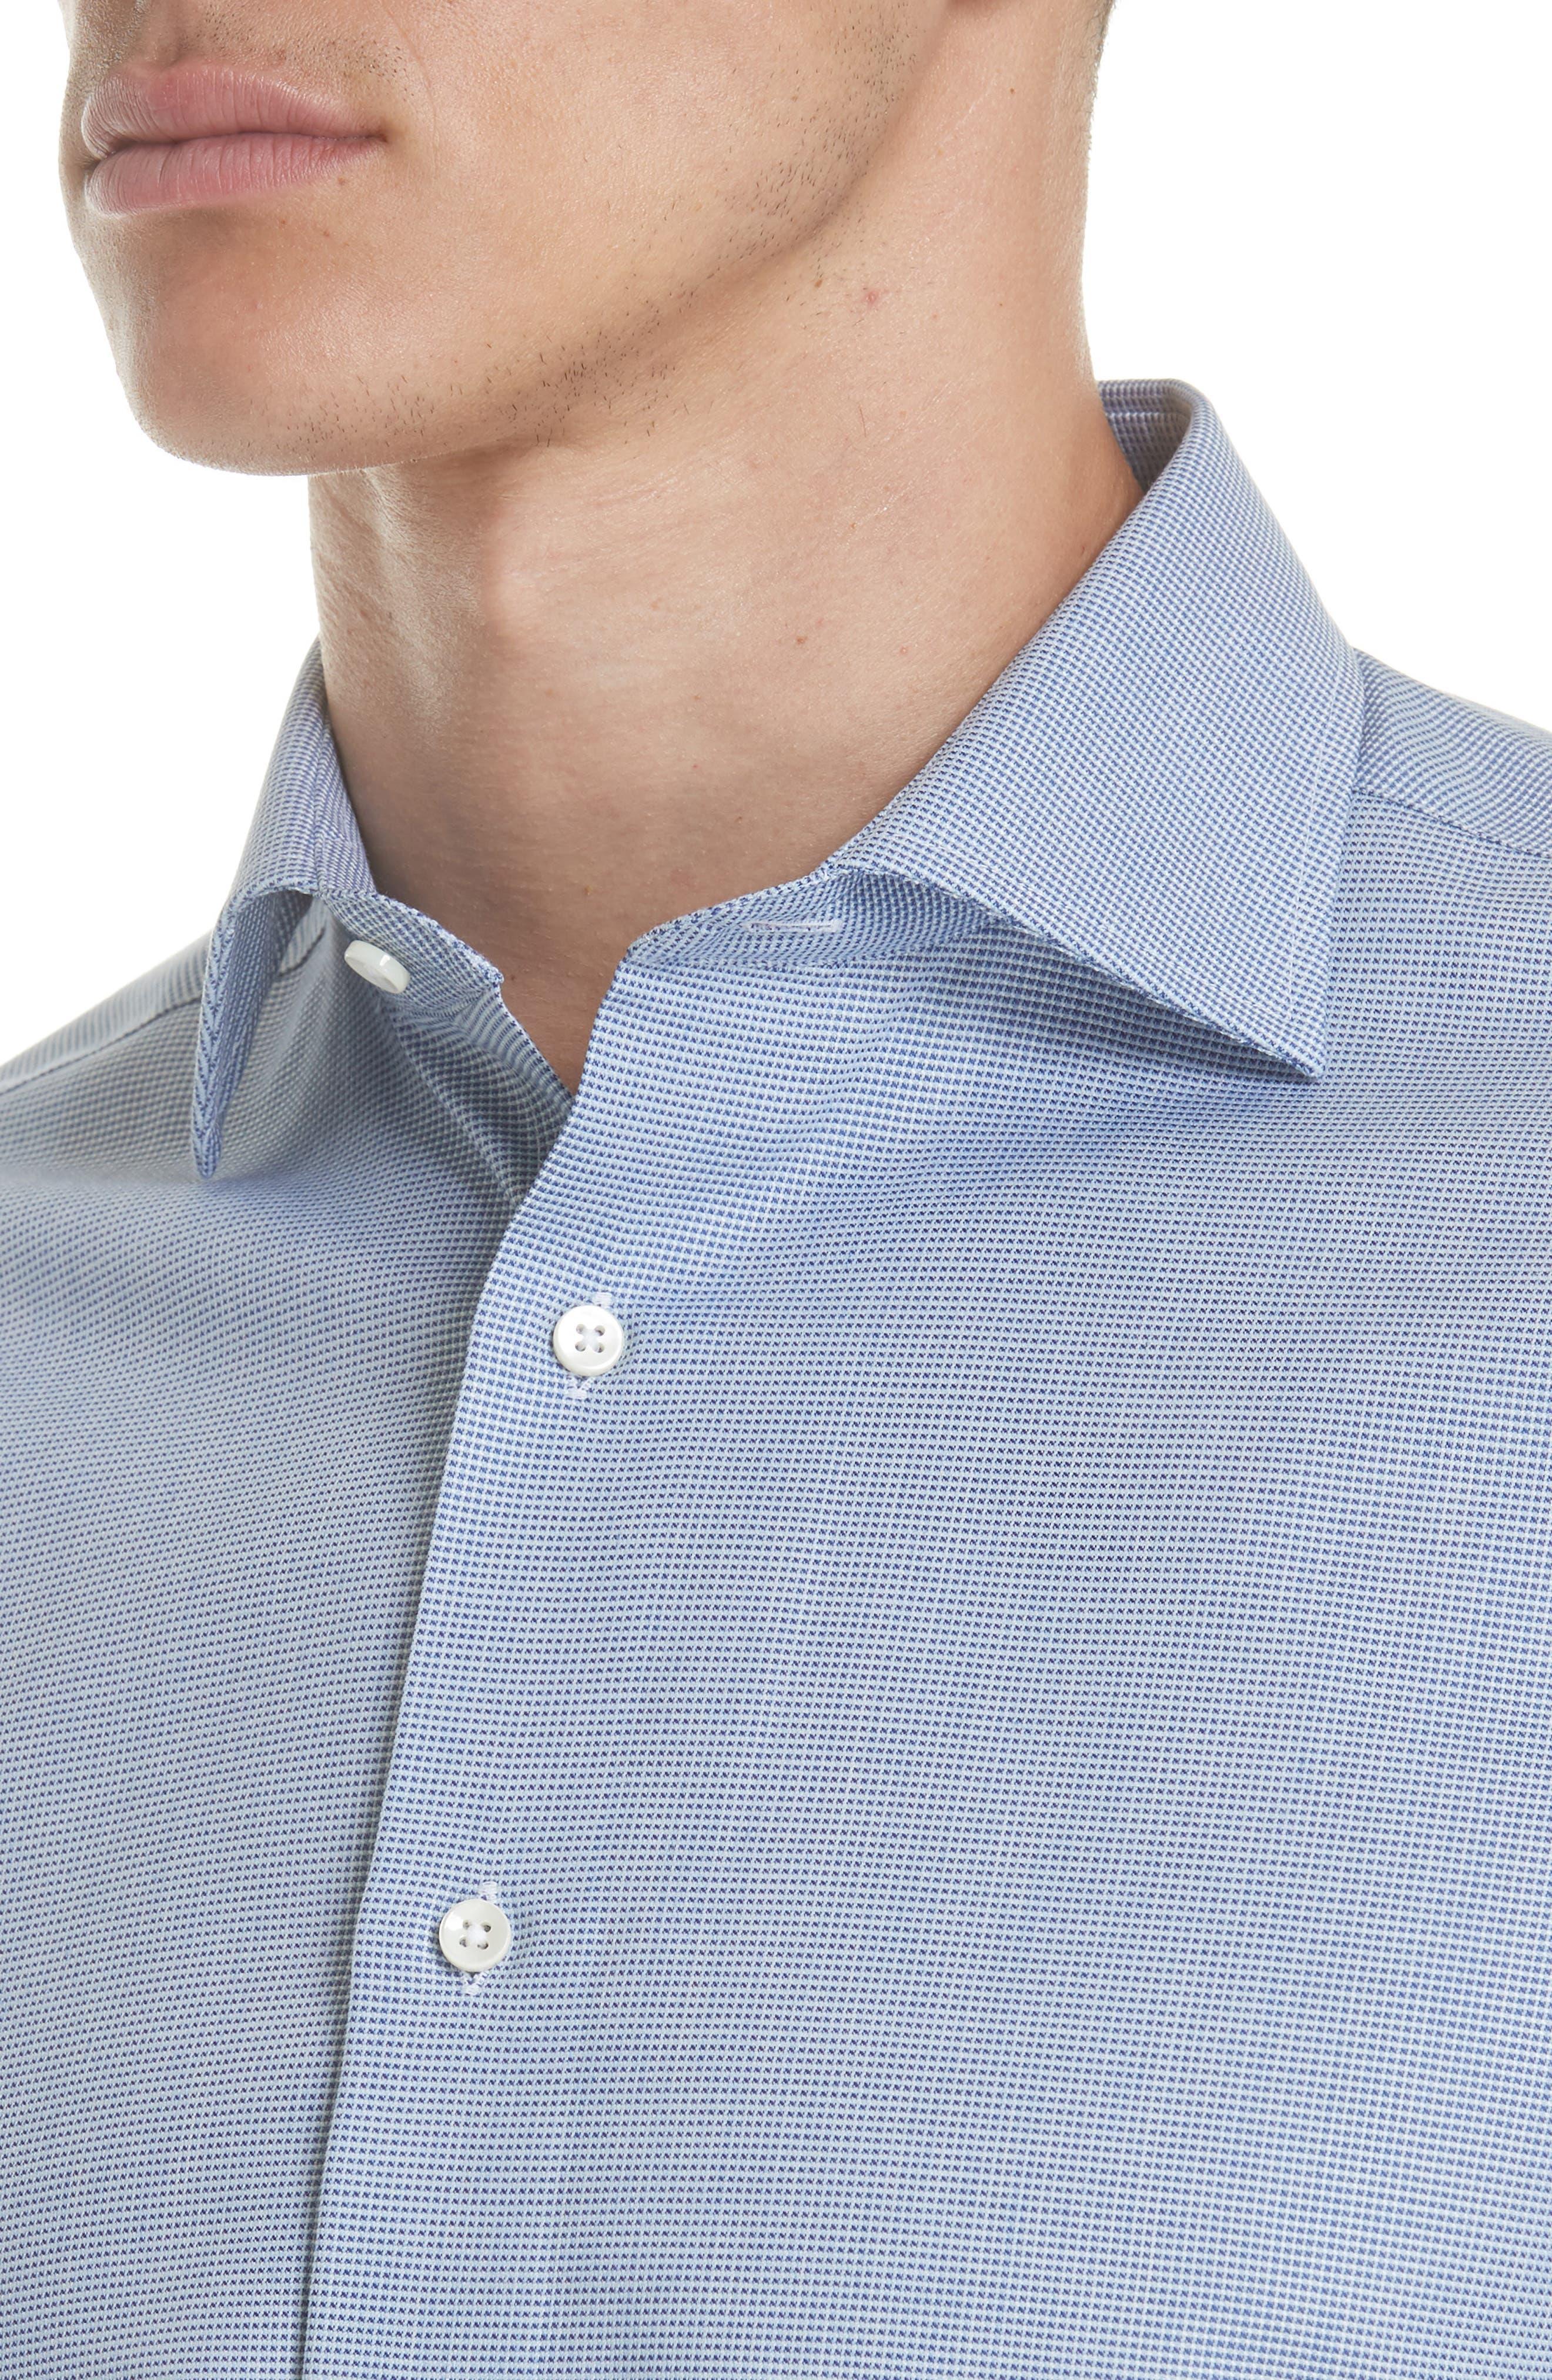 Regular Fit Solid Dress Shirt,                             Alternate thumbnail 2, color,                             401